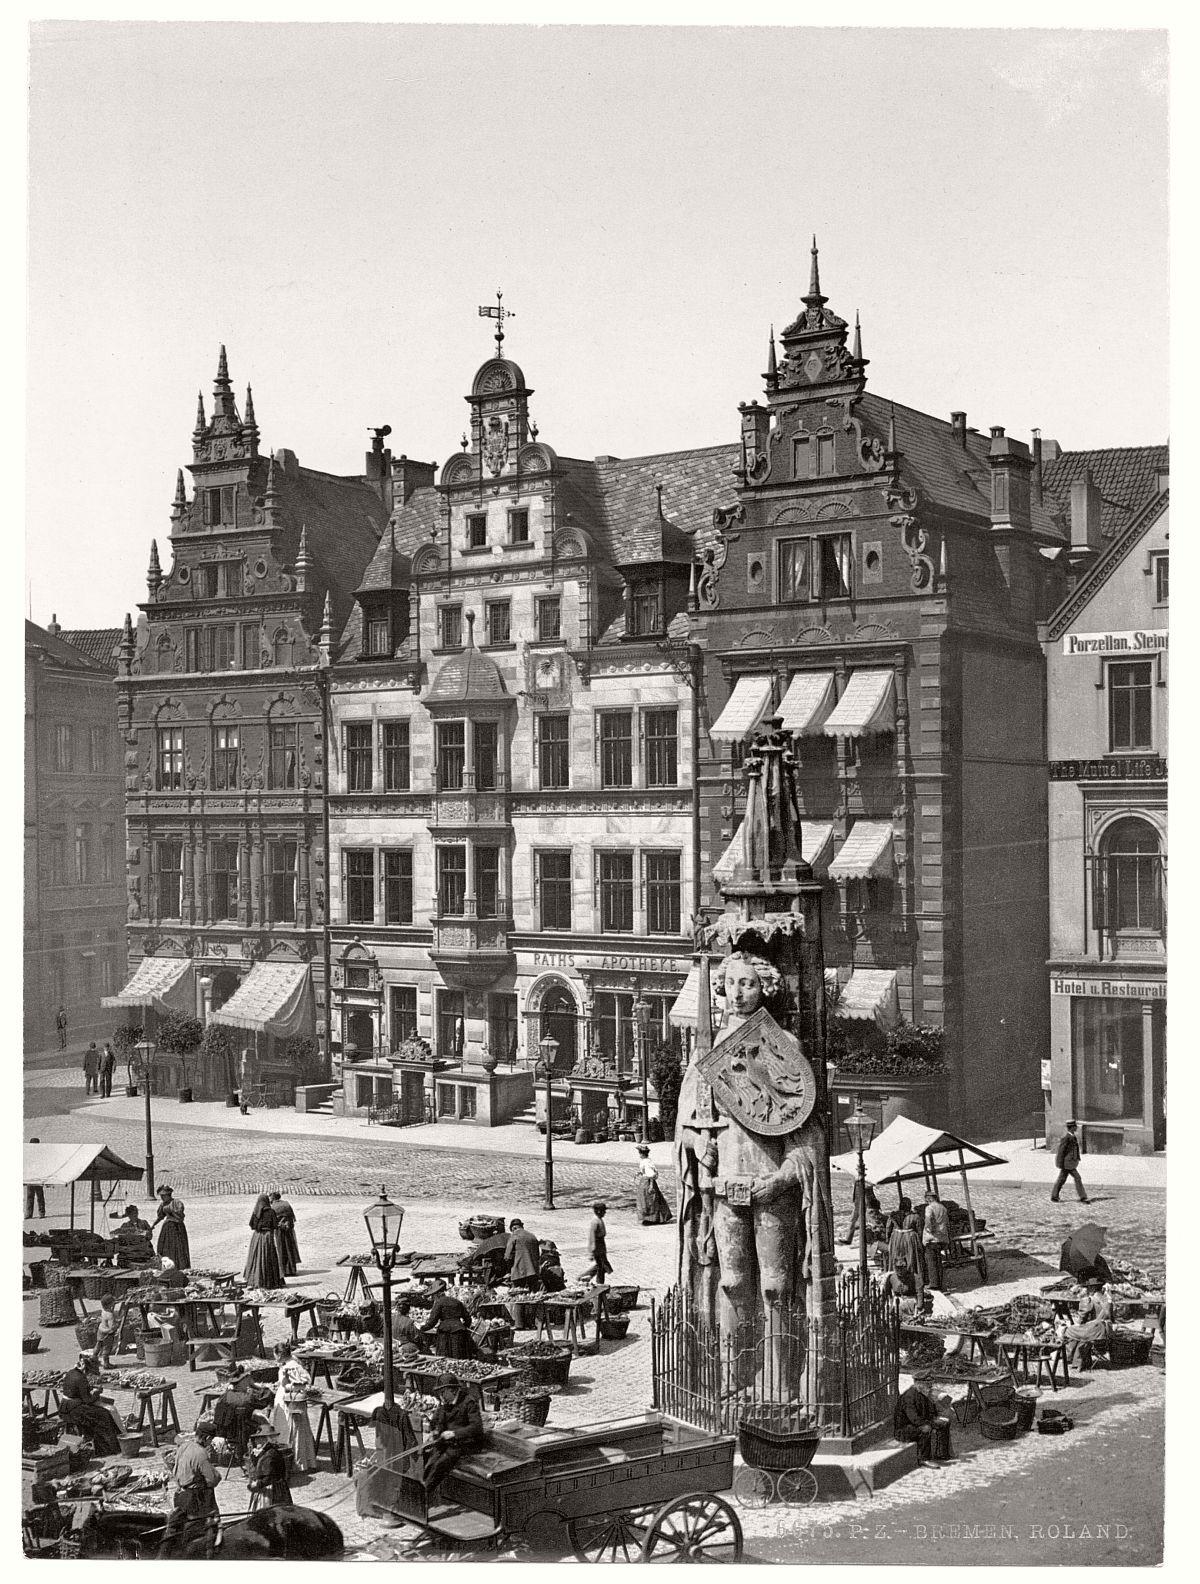 vintage-historic-photos-of-bremen-germany-circa-1890s-19th-century-09